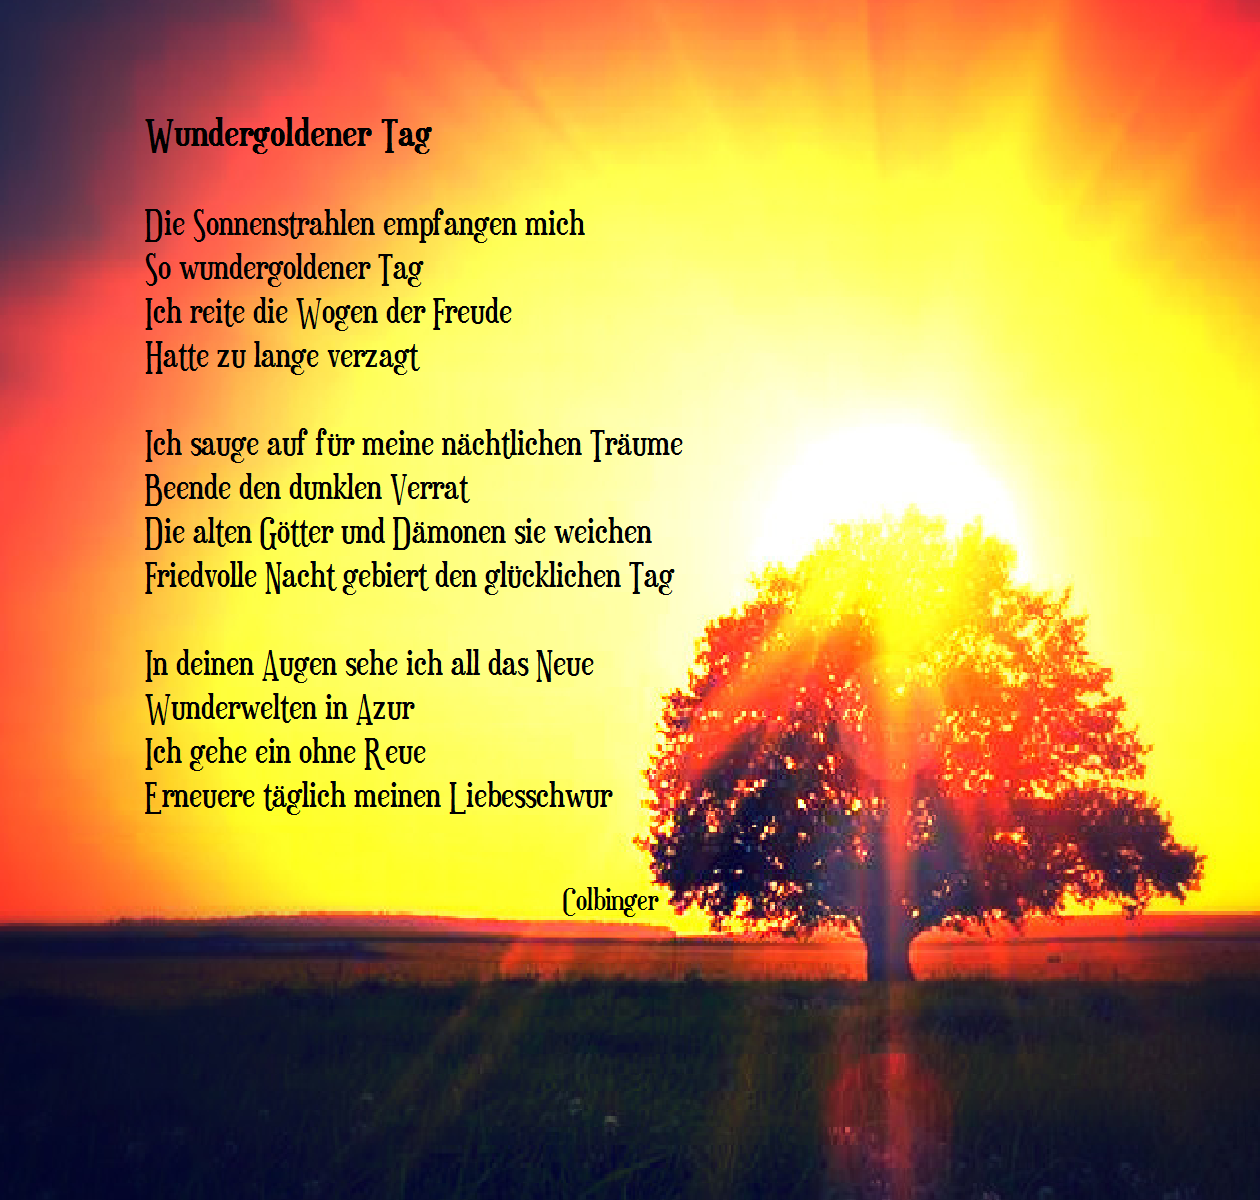 Wundergoldener Tag